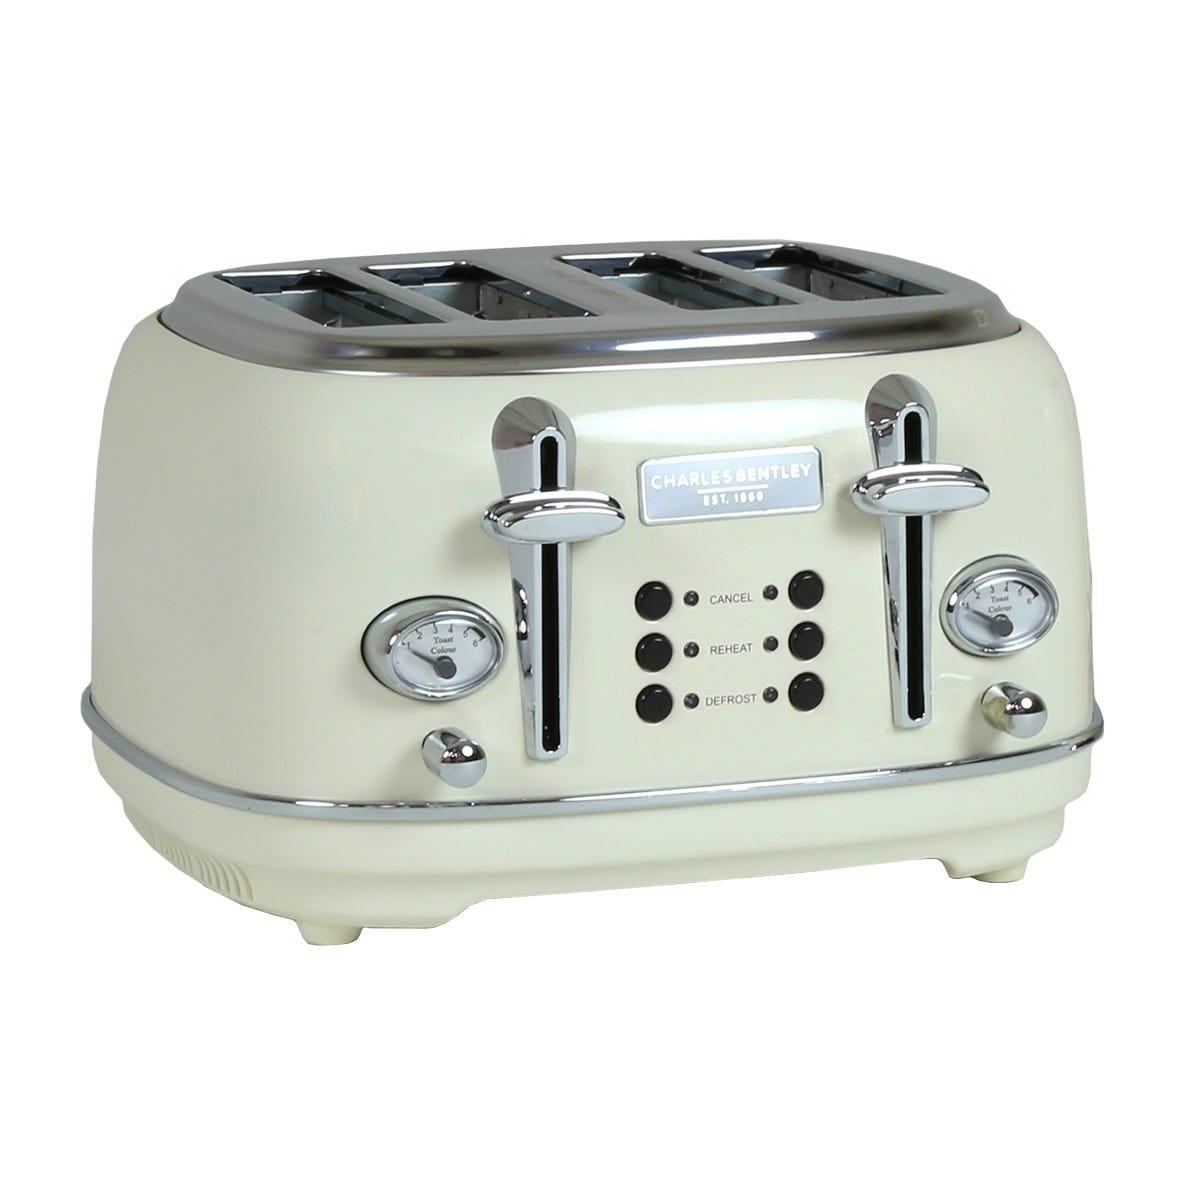 Charles Bentley TORE01CR 4 Slice Toaster - Cream & Chrome